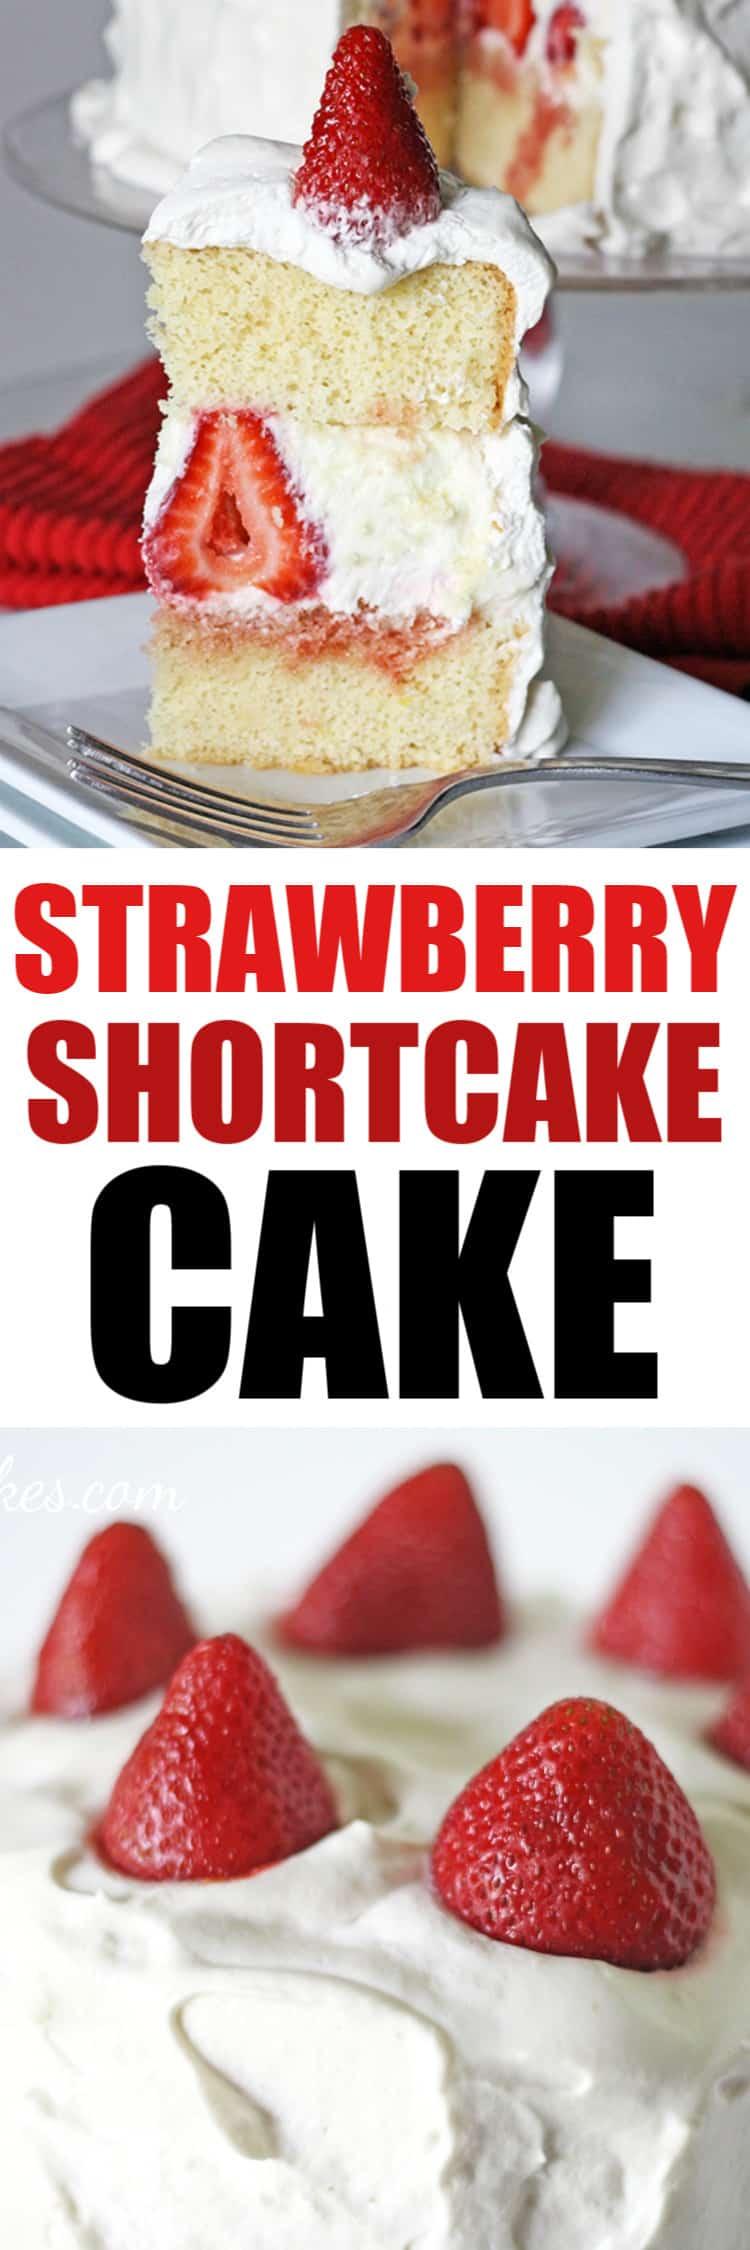 Strawberry Shortcake Cake Recipe with Fresh Strawberries